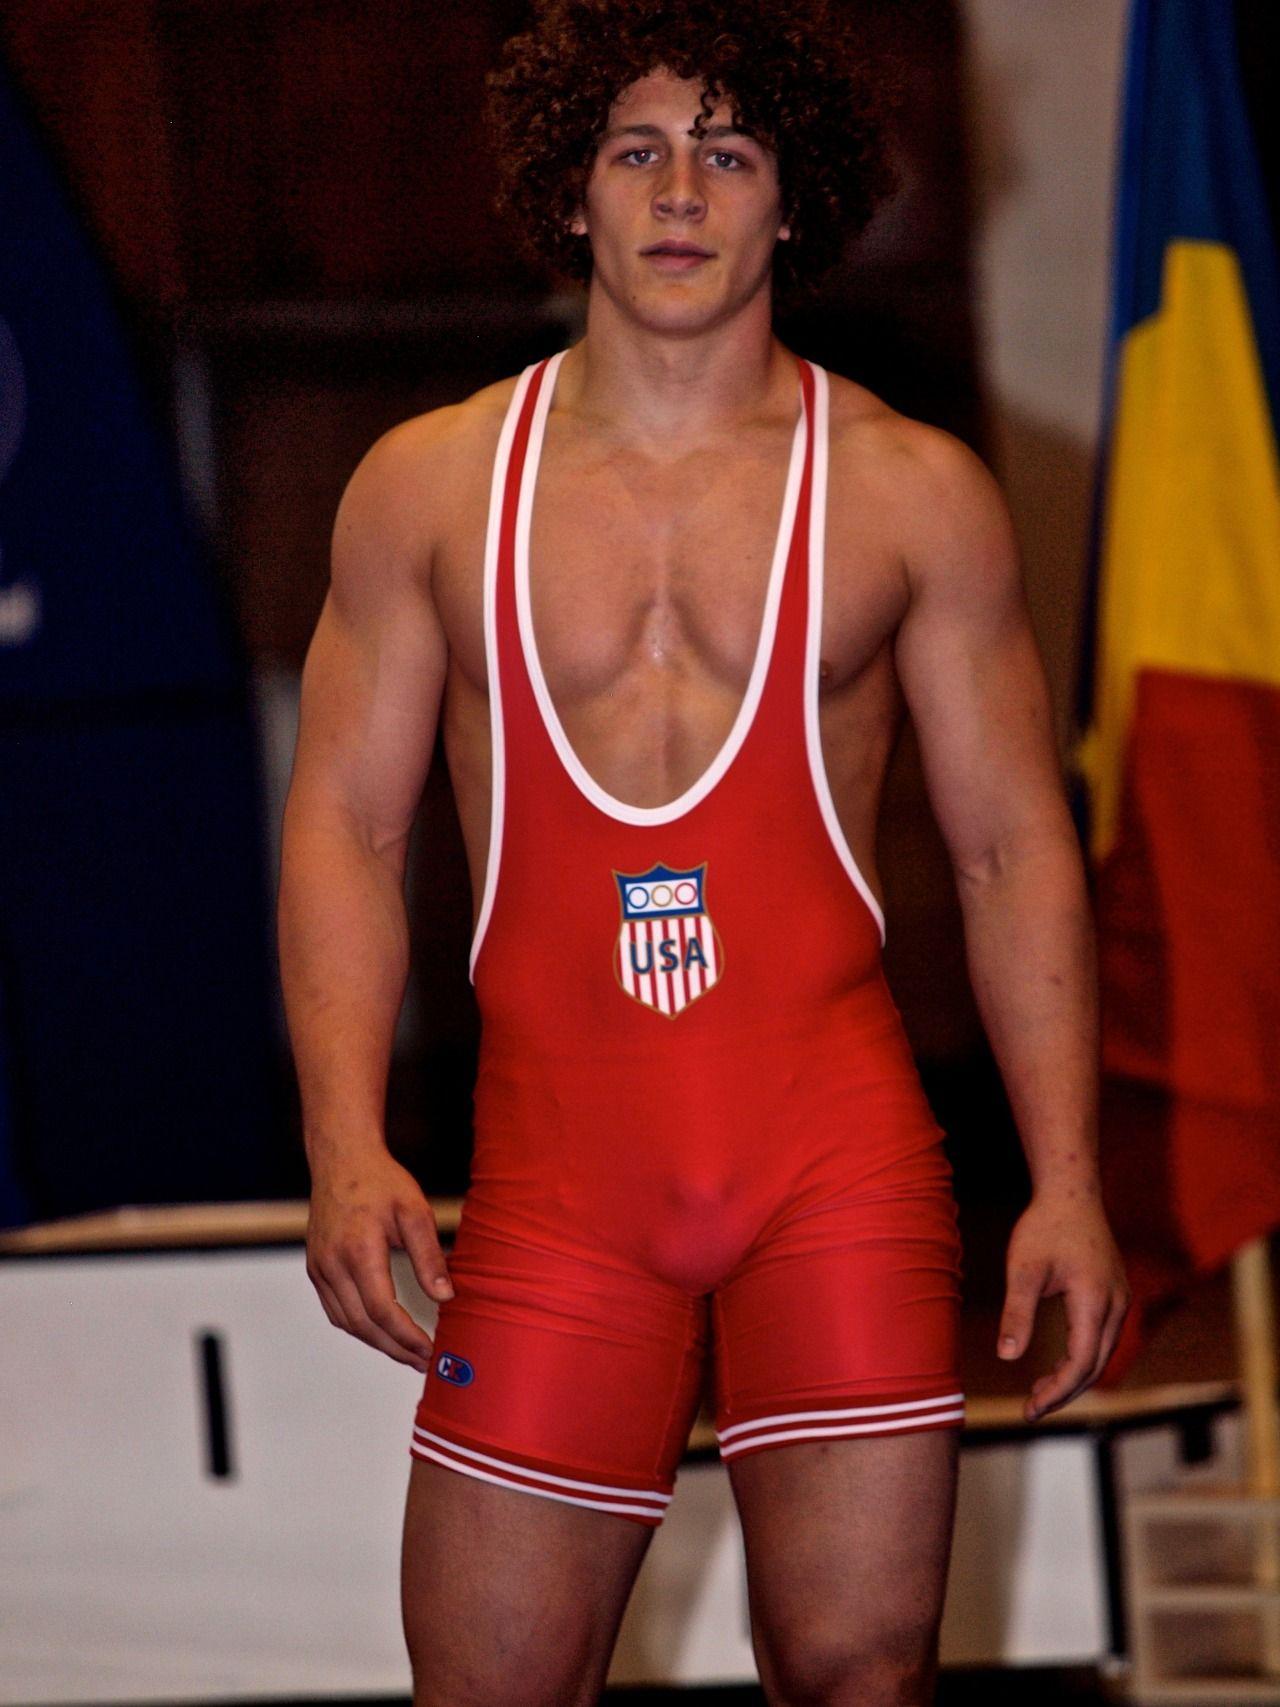 Ohio State wrestling freshman Kyle Snyder sets sights on